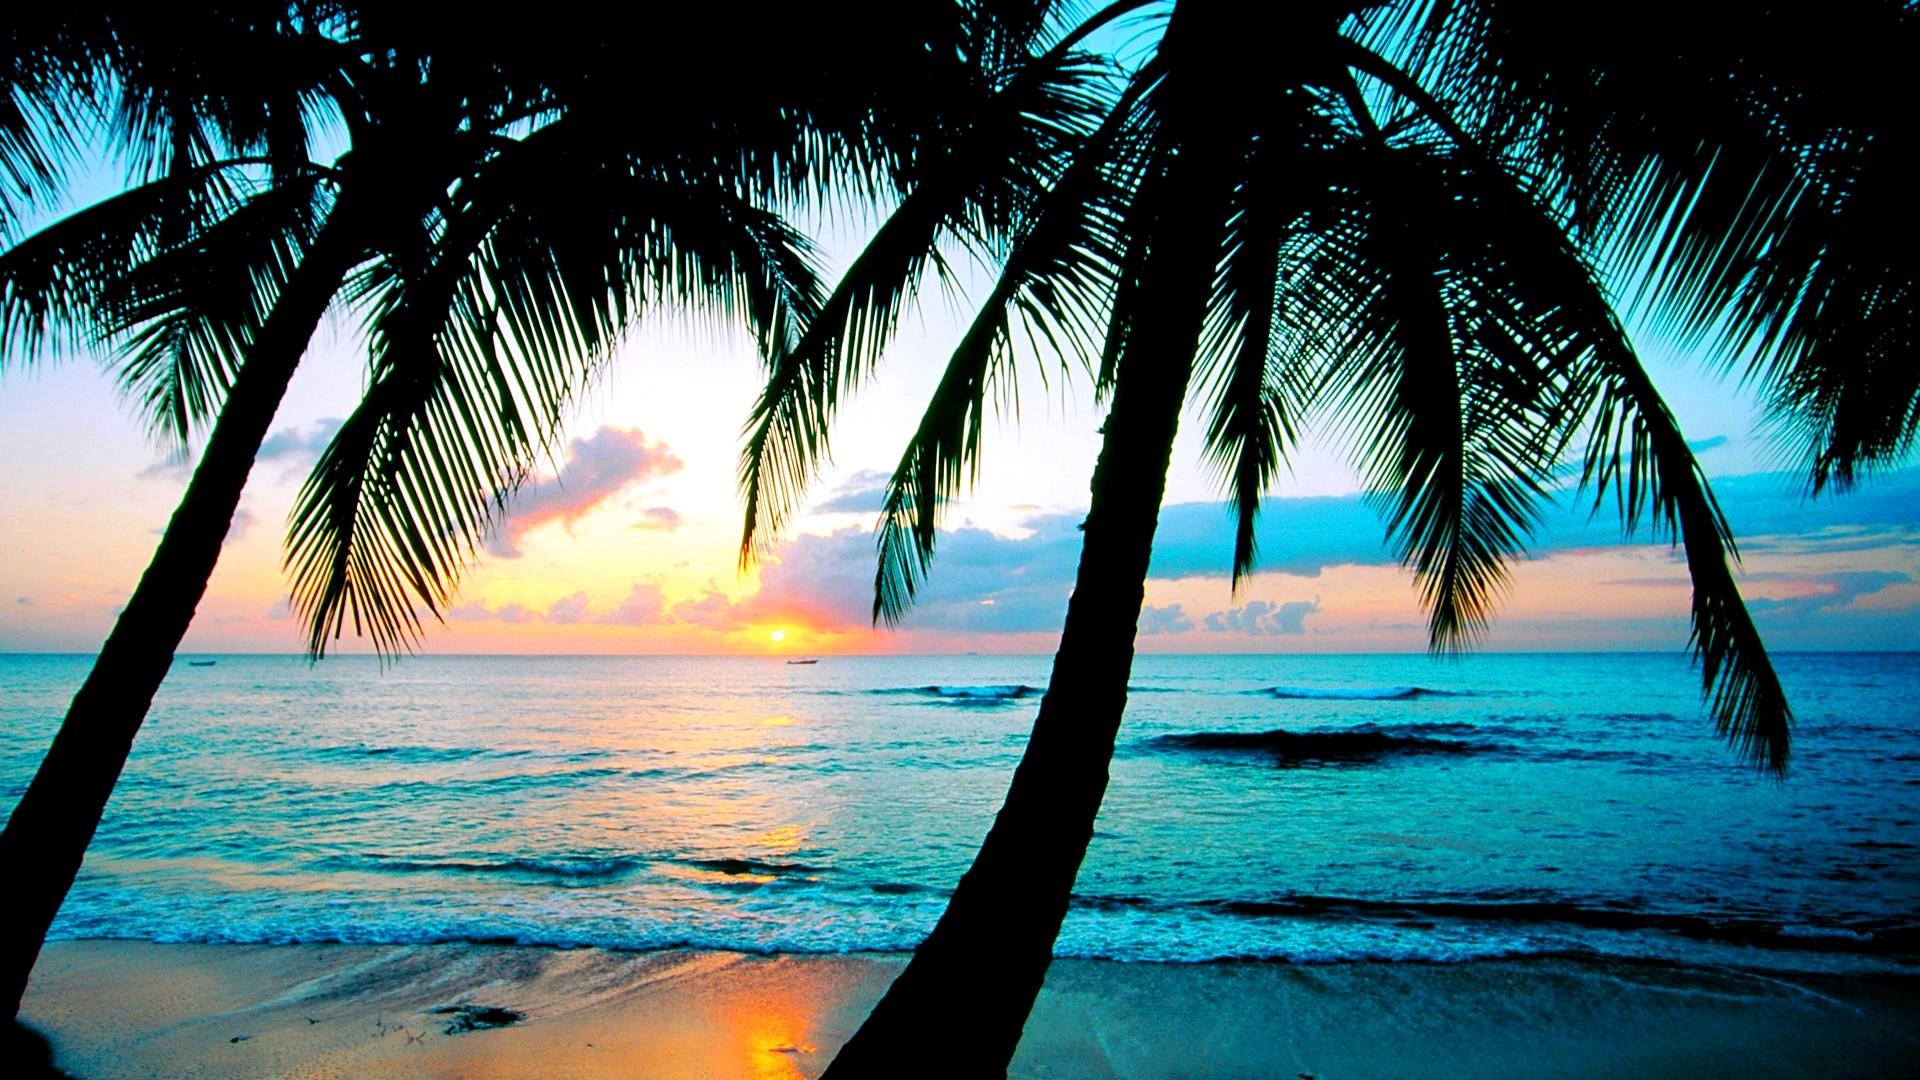 beach desktop wallpapers download | Desktop Backgrounds for Free HD .